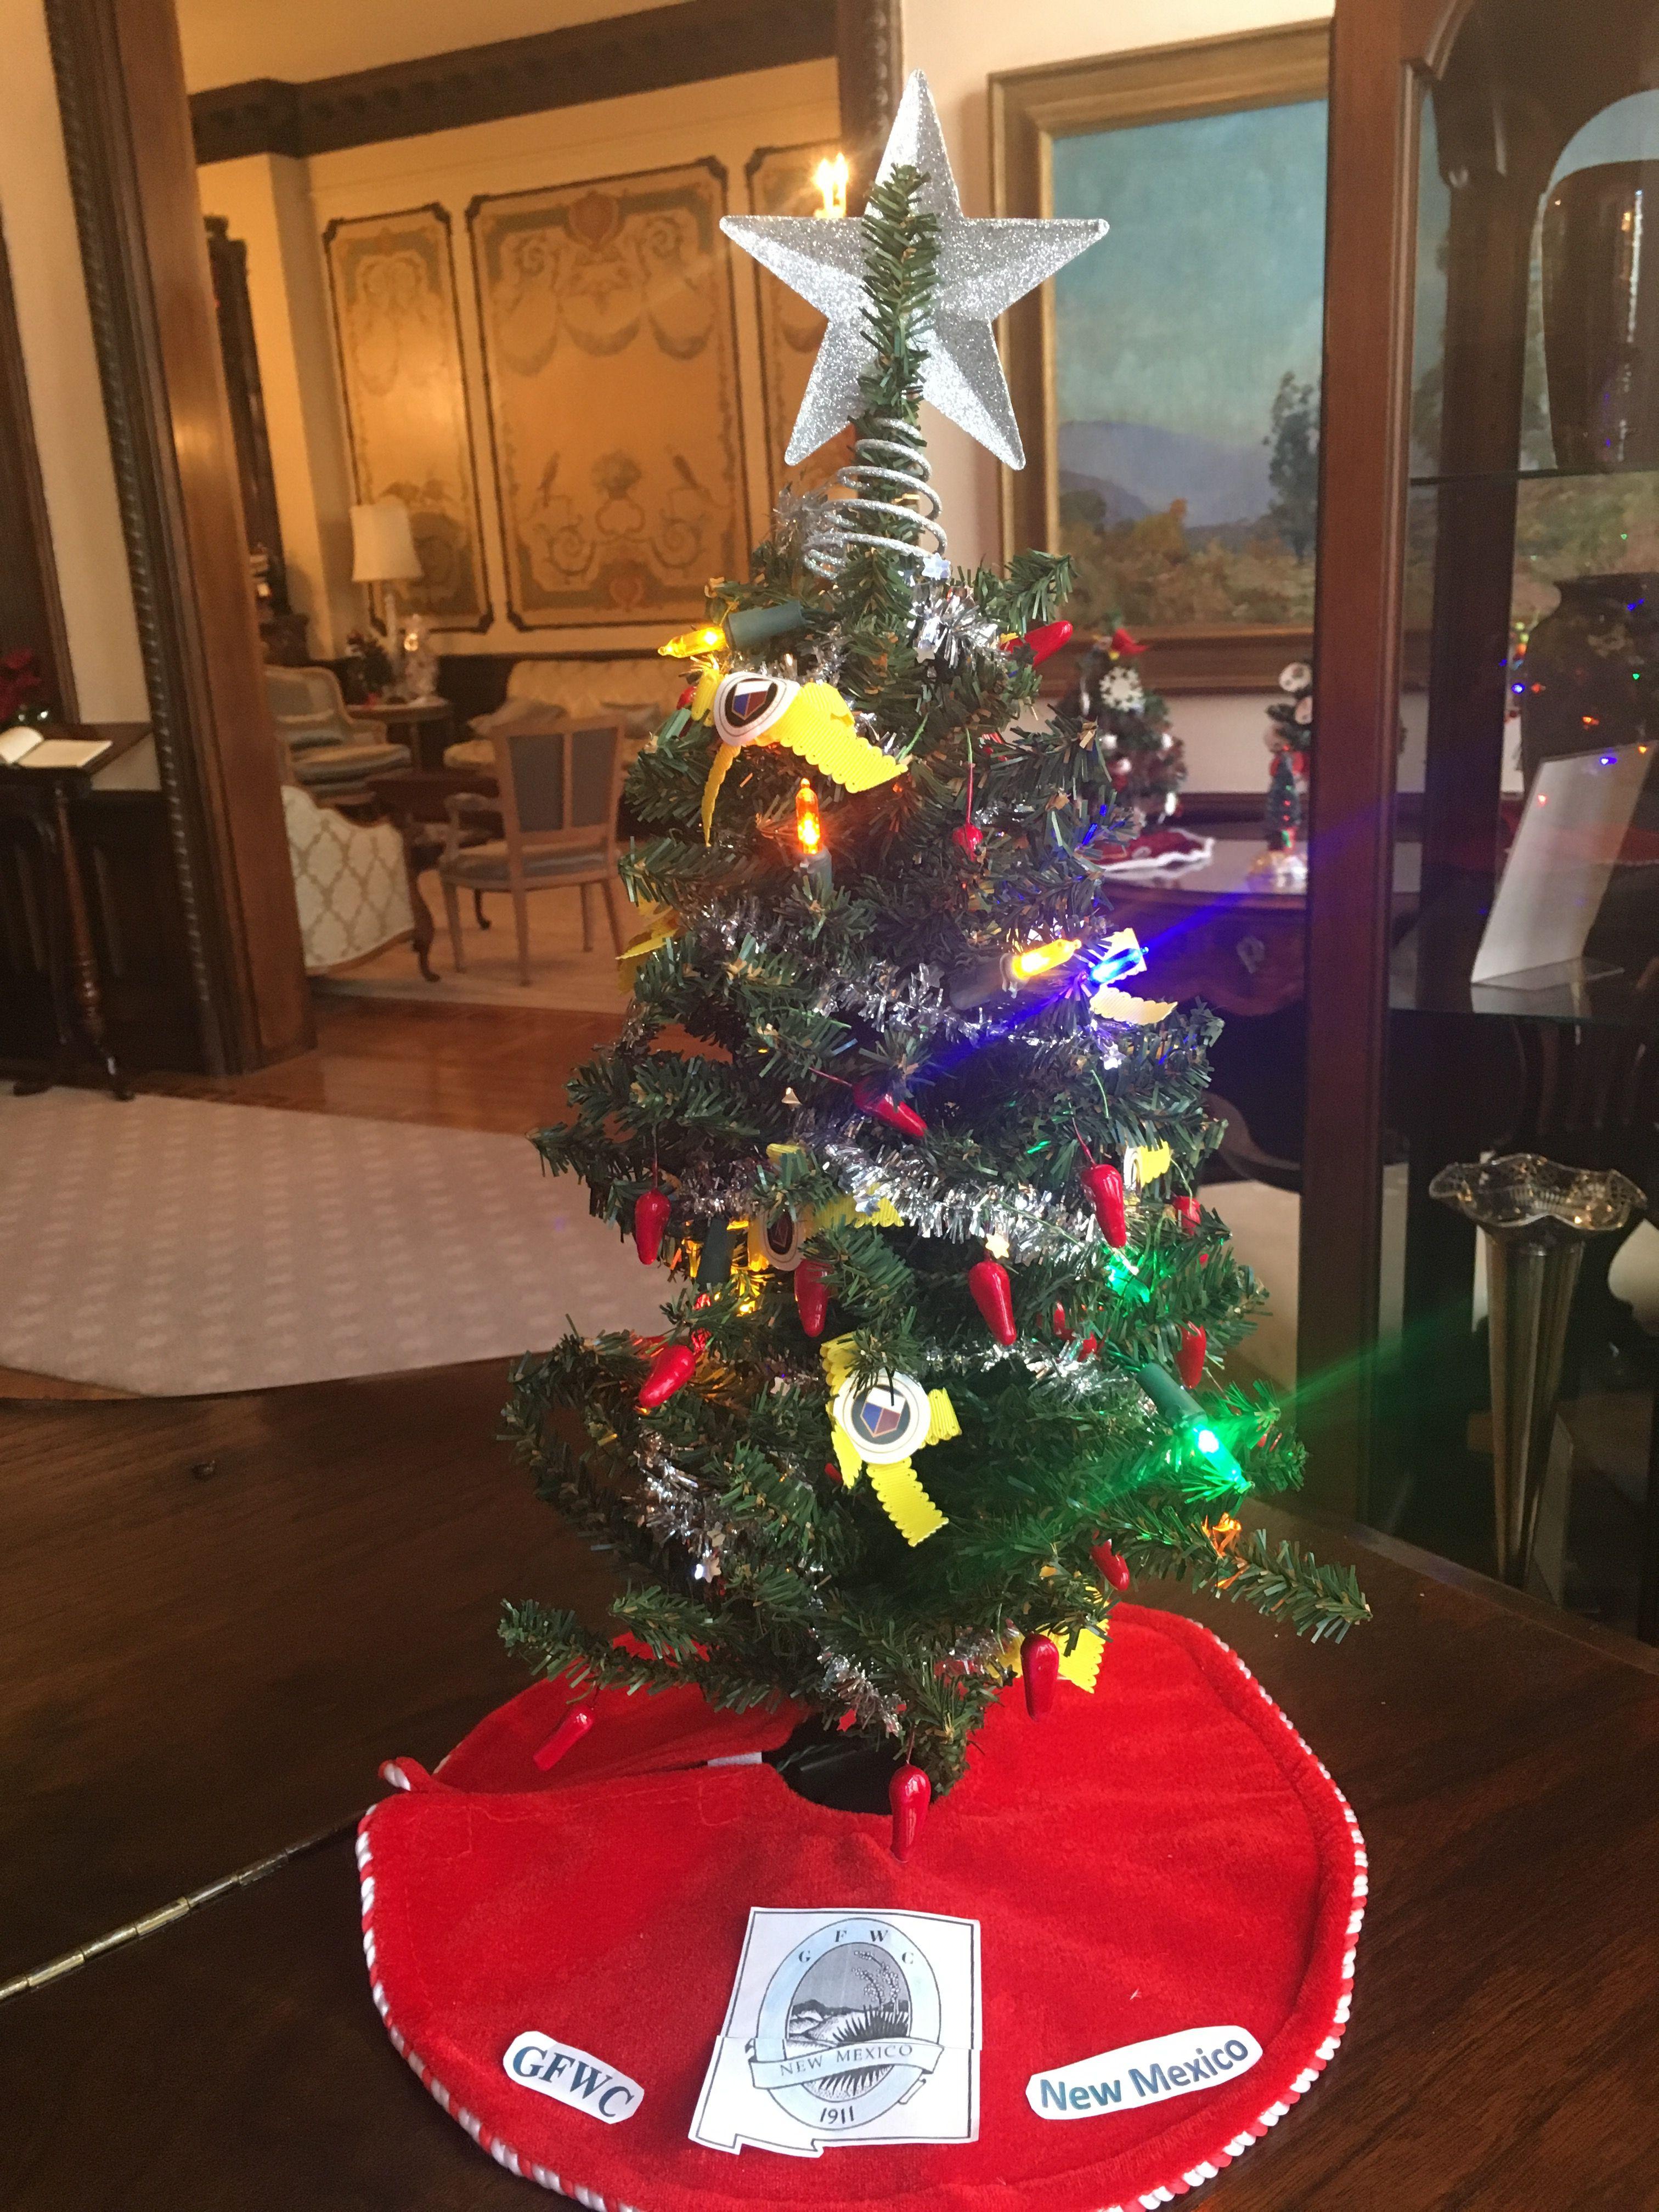 Gfwc New Mexico Holiday Decor Christmas Tree Christmas Tree Skirt